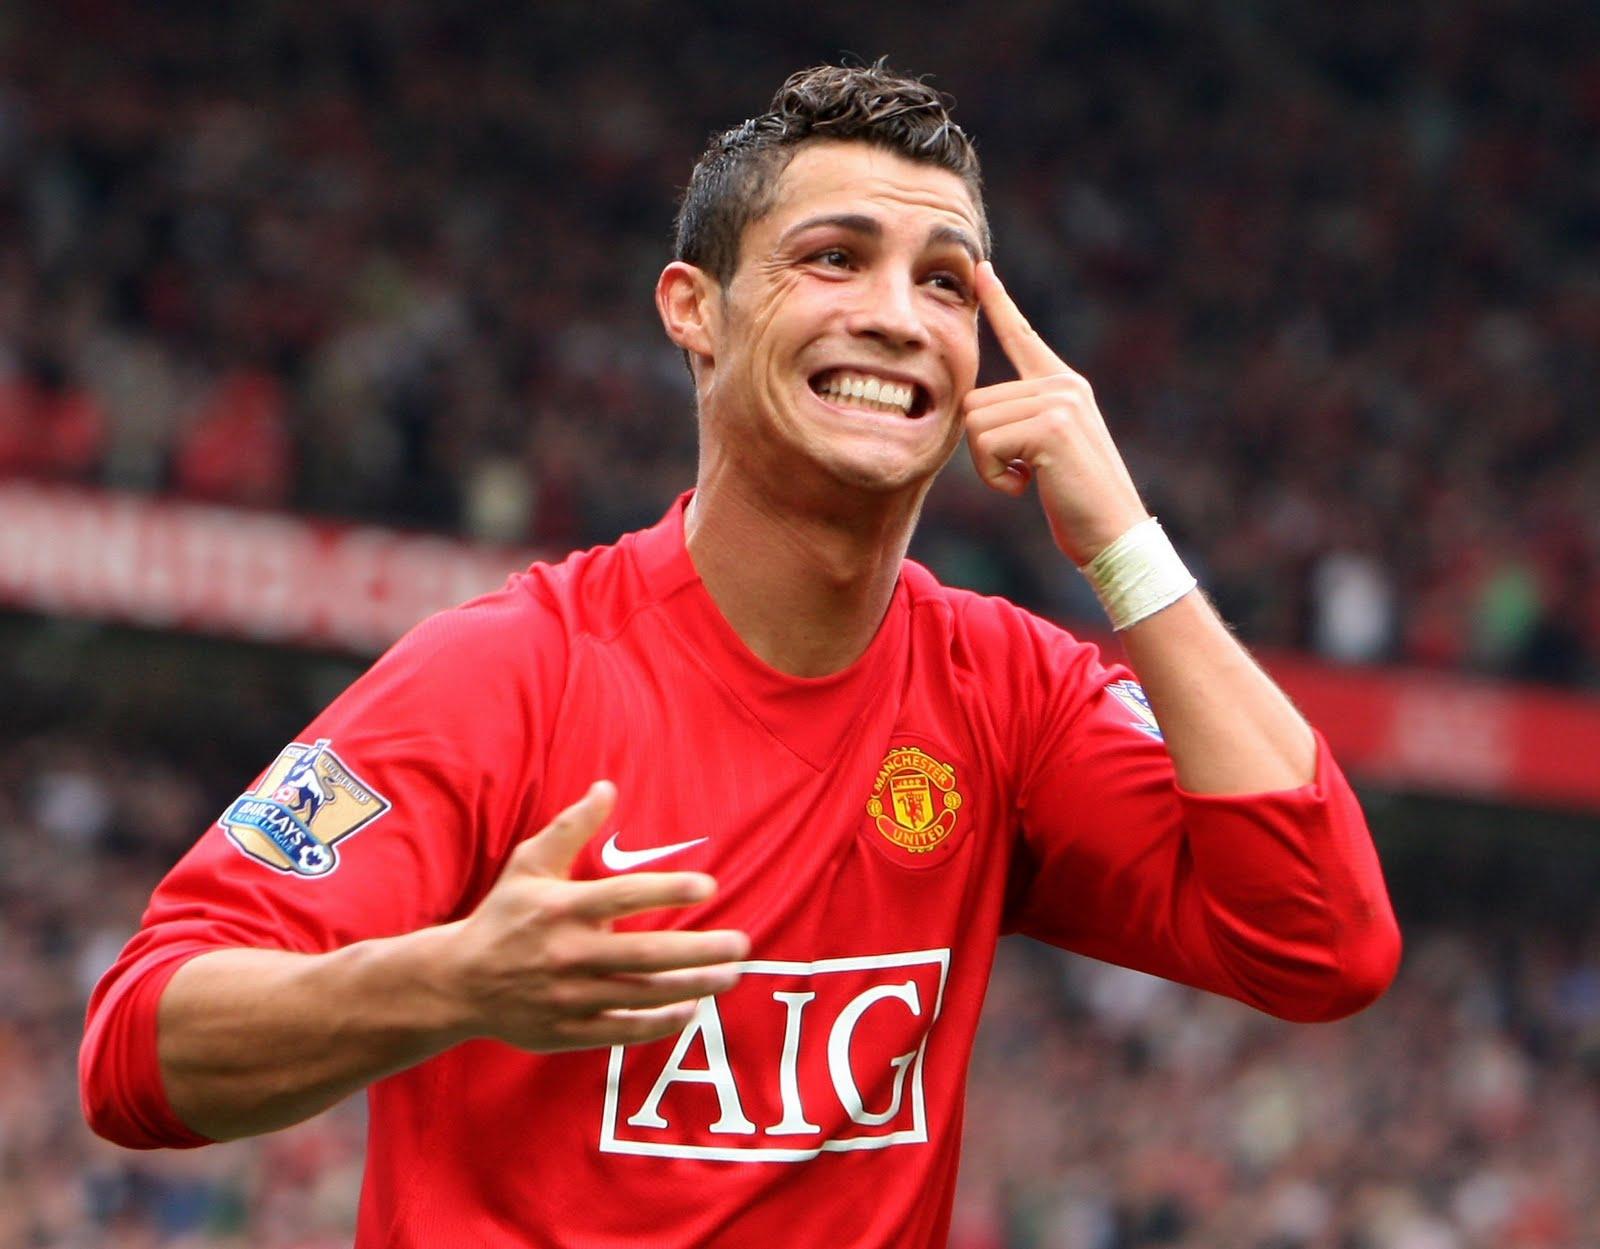 http://2.bp.blogspot.com/-z64JLXZx-HA/TkELIXvKufI/AAAAAAAAAIo/DVlny0s7mDc/s1600/Cristiano-Ronaldo_0.jpg